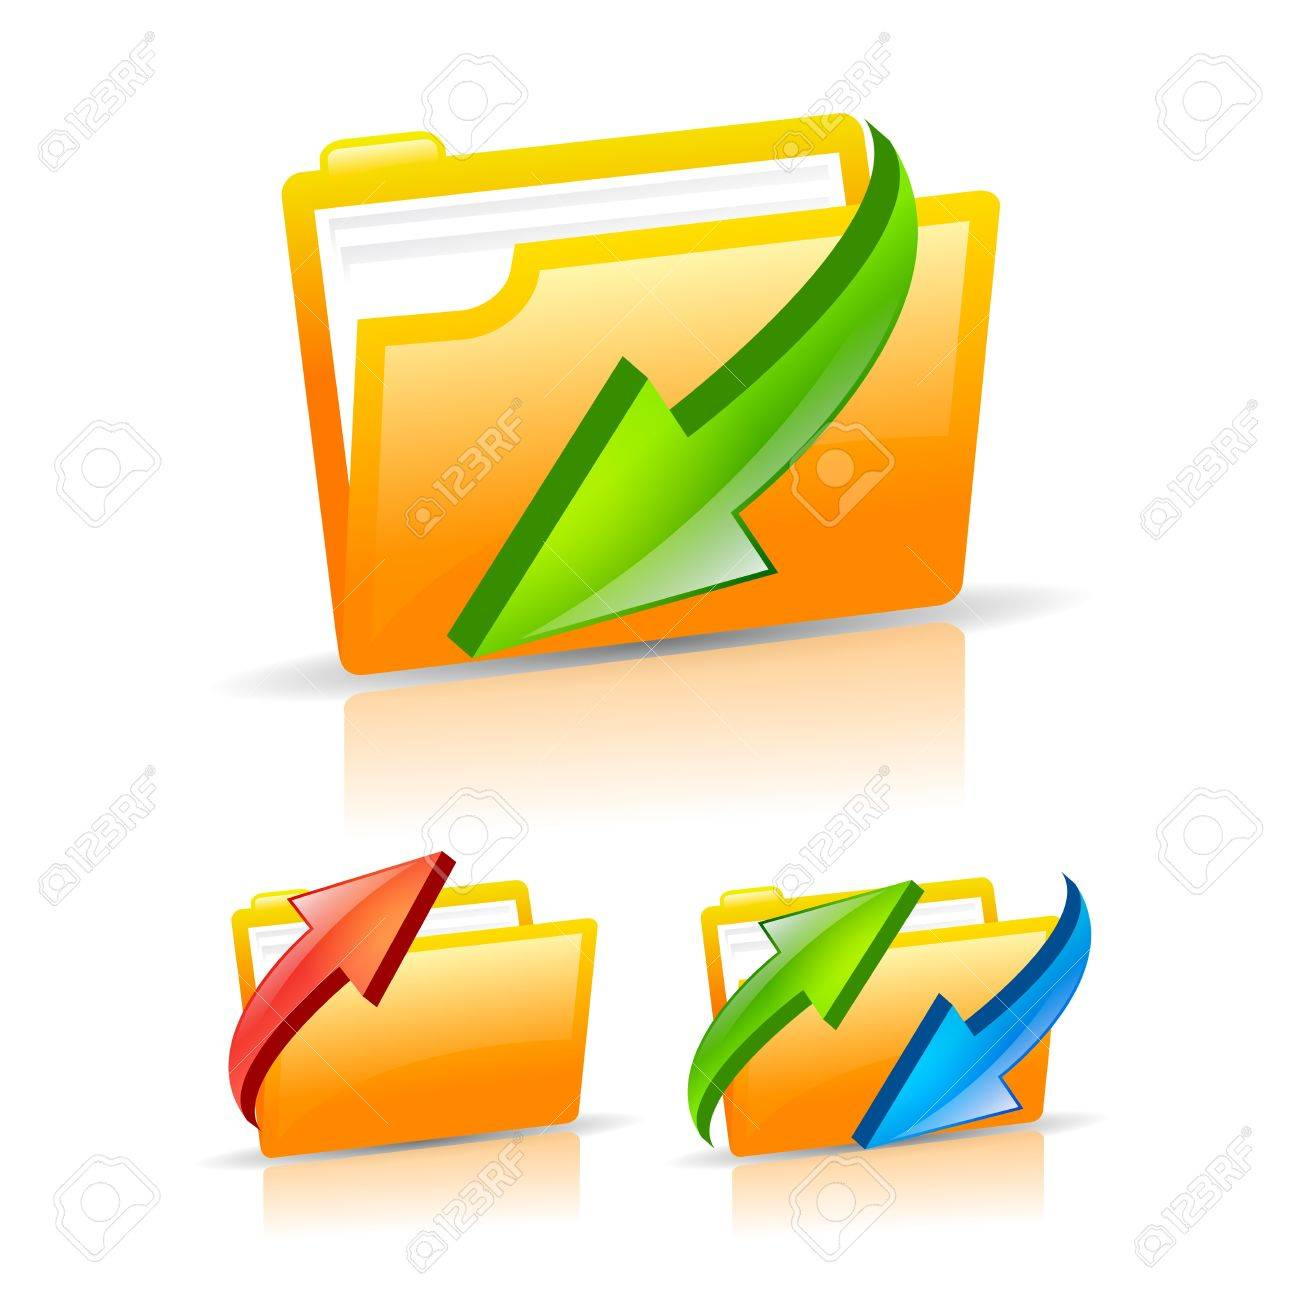 Folder icons set, illustration Stock Vector - 16449364